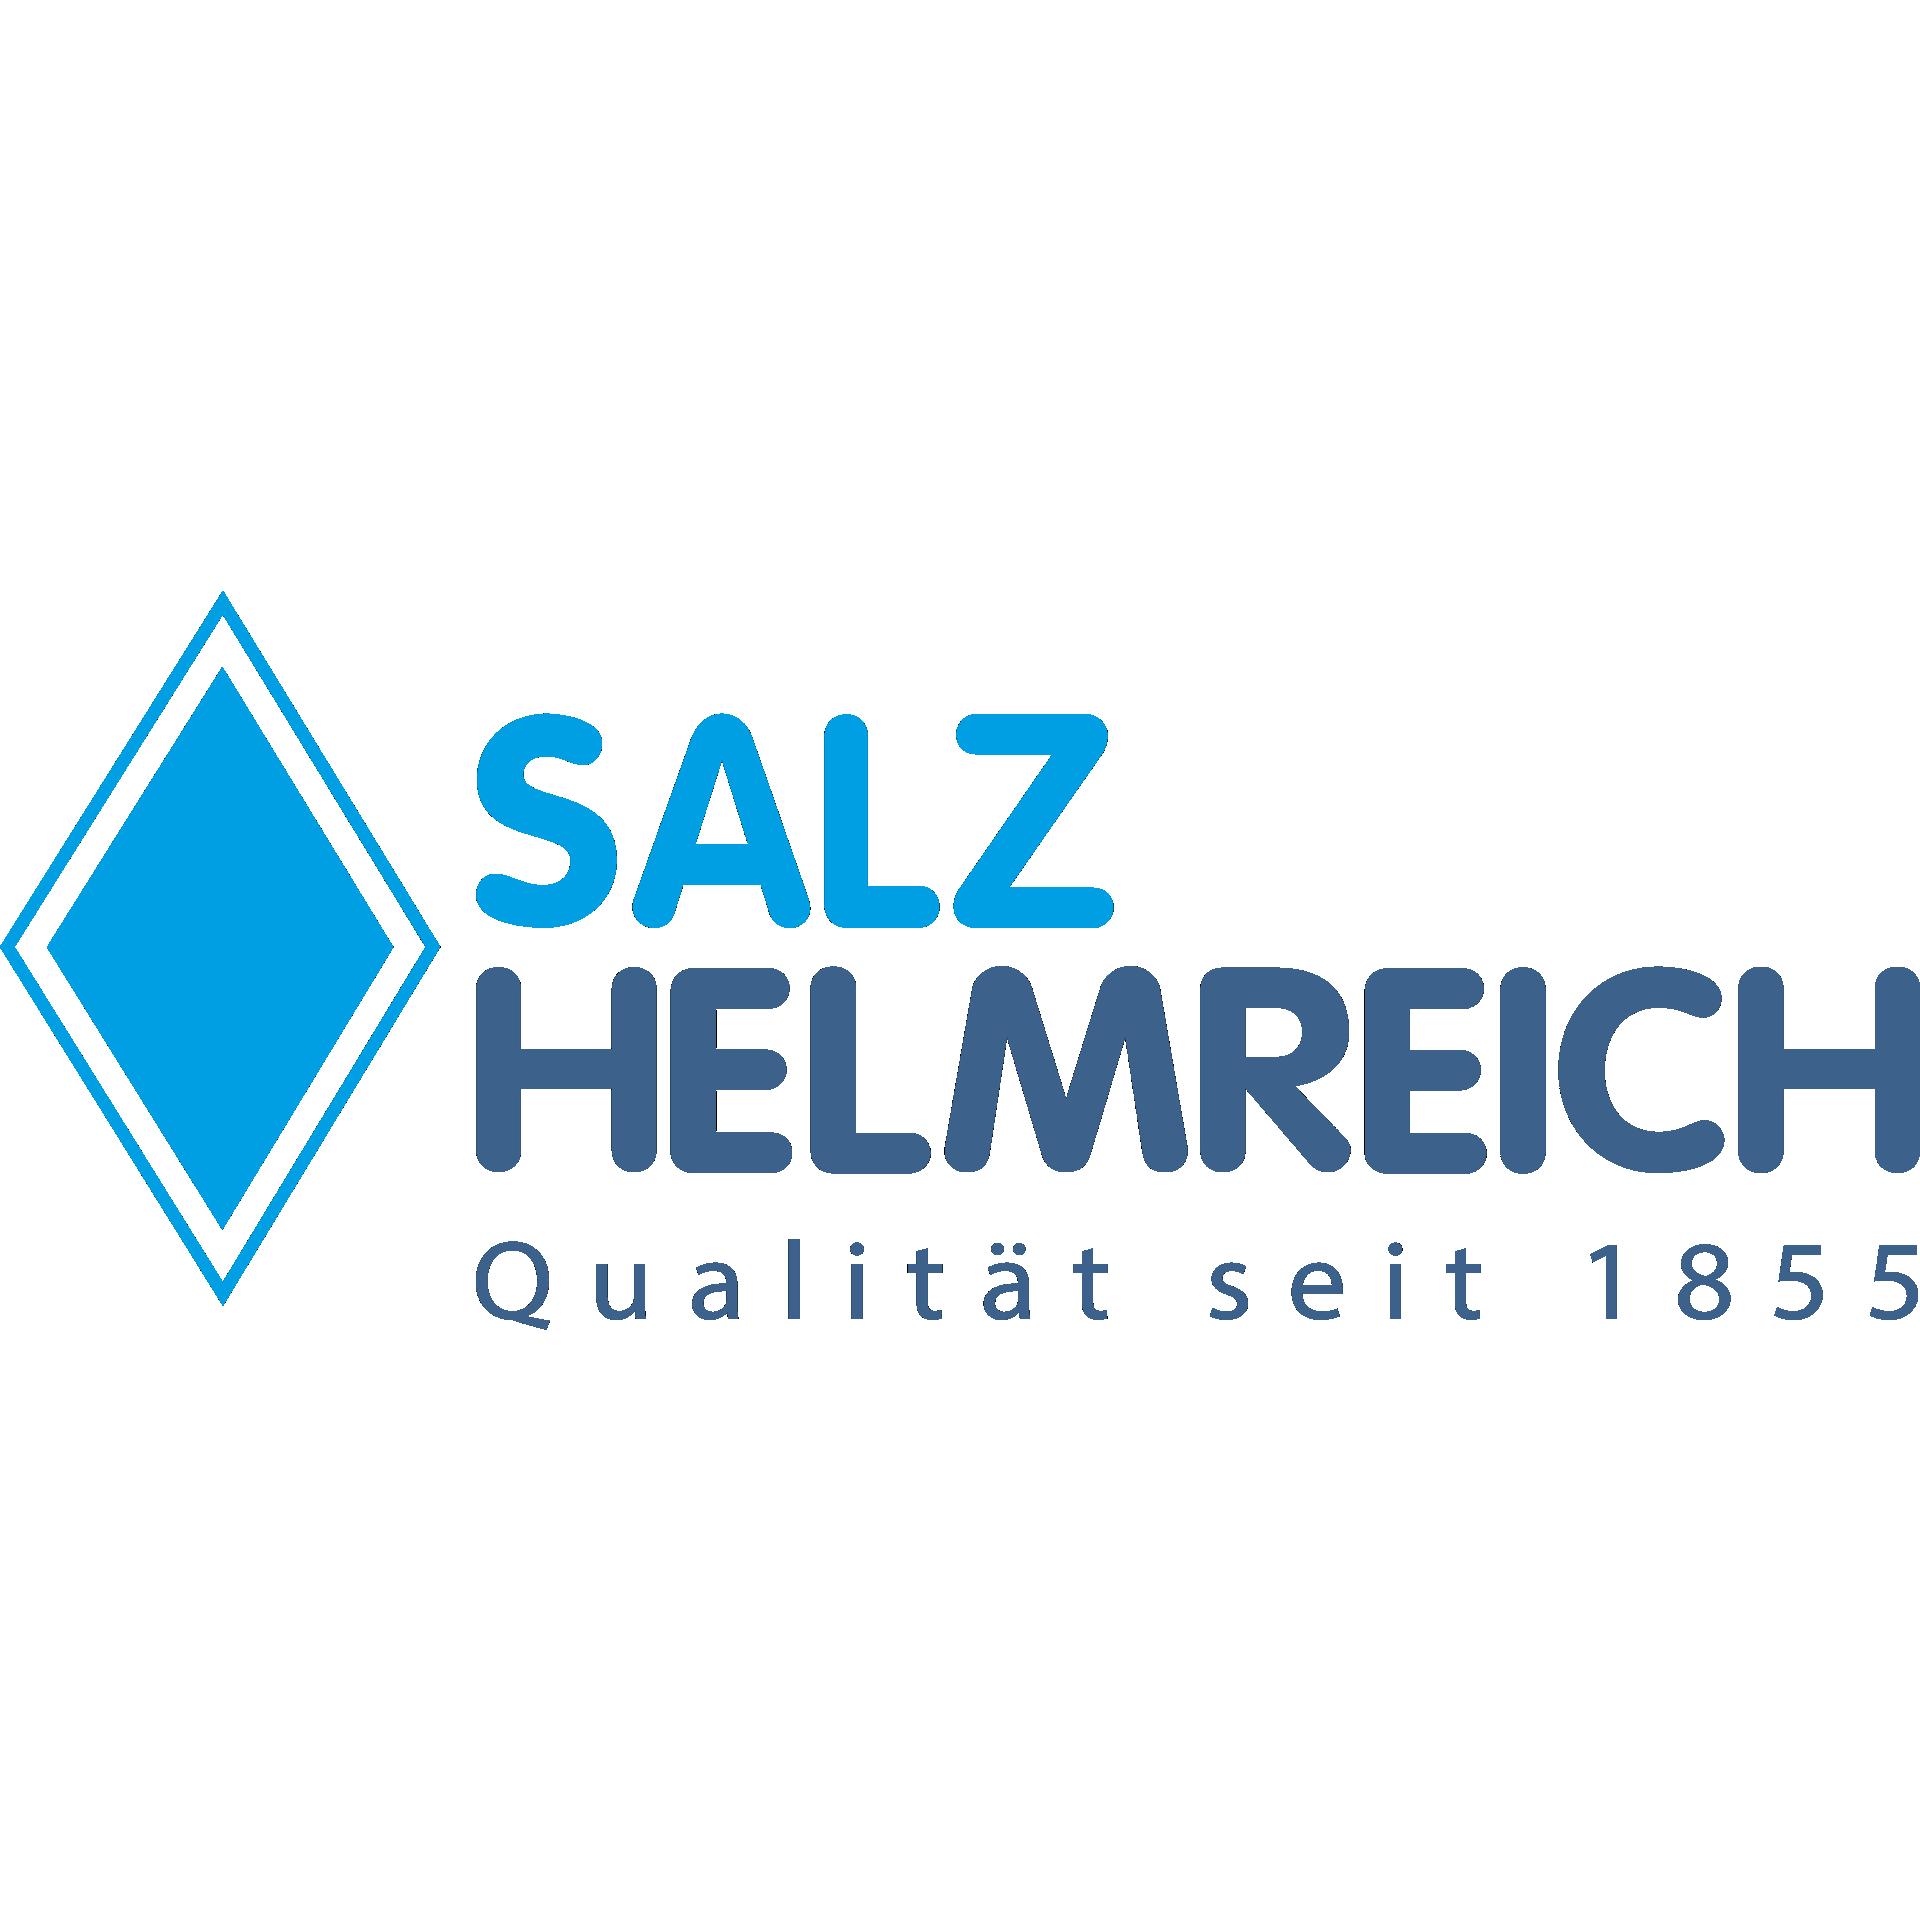 Natriumchlorid Sodiumchlorid Pharma Ph.Eur./USP Excipient Quality Made in Germany im 25 kg Sack